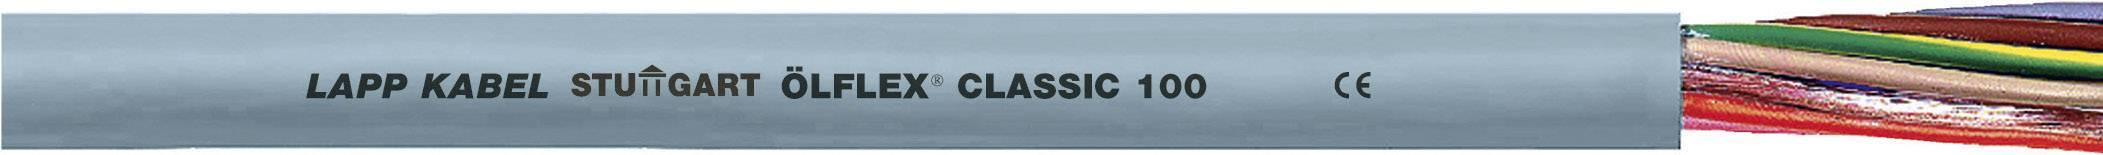 Kabel LappKabel Ölflex CLASSIC 100 8G0,75 (0010027), PVC, 8,8 mm, 500 V, šedá, 500 m